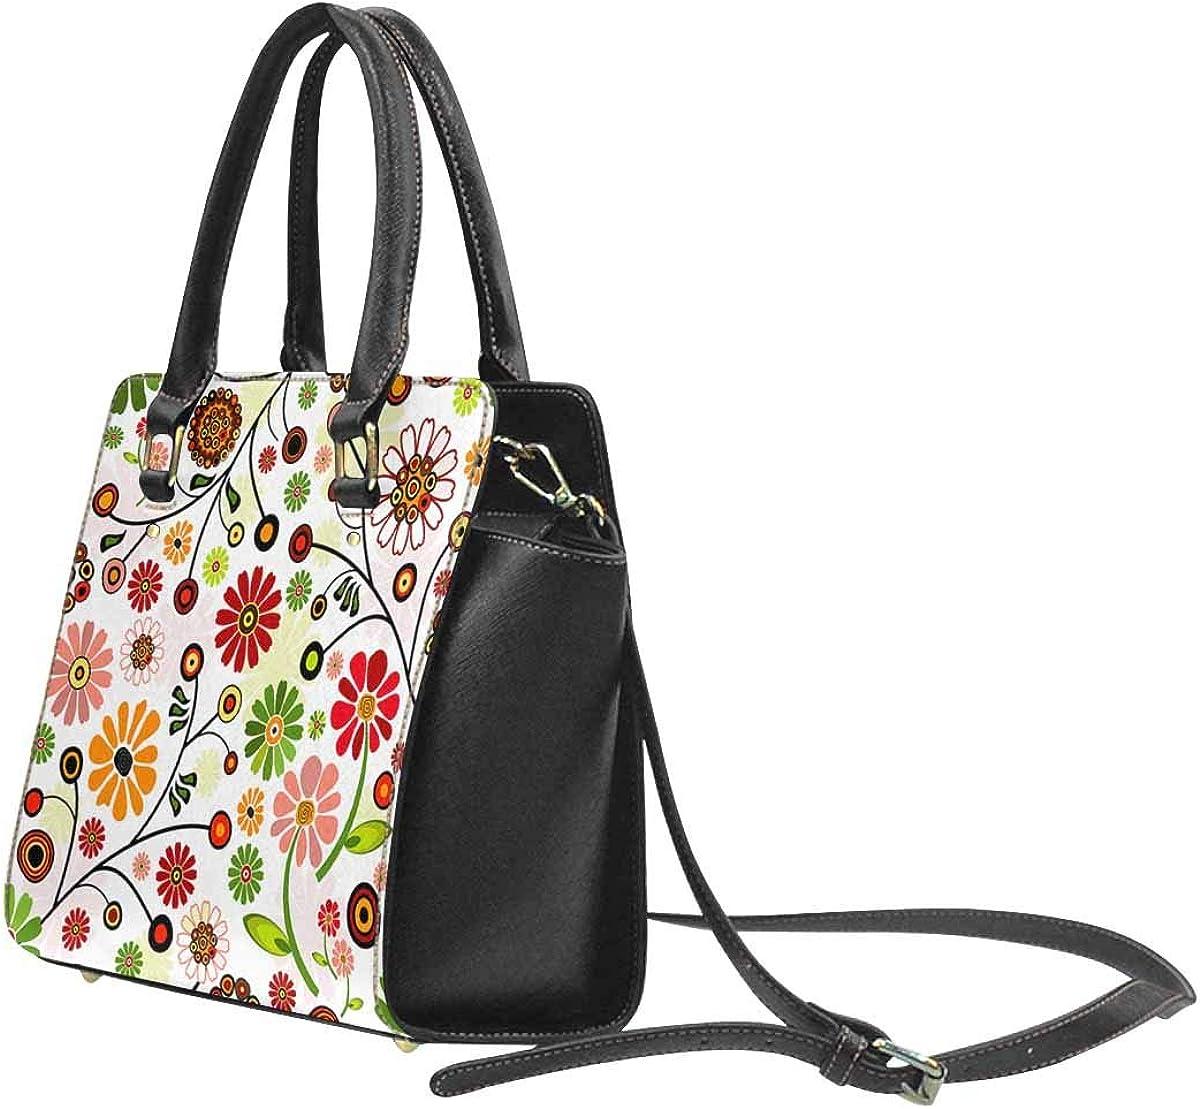 INTERESTPRINT Floral Vivid Pattern with Colorful Flowers Handbags Tote Bag Shoulder Bag Top Handle Satchel Purse